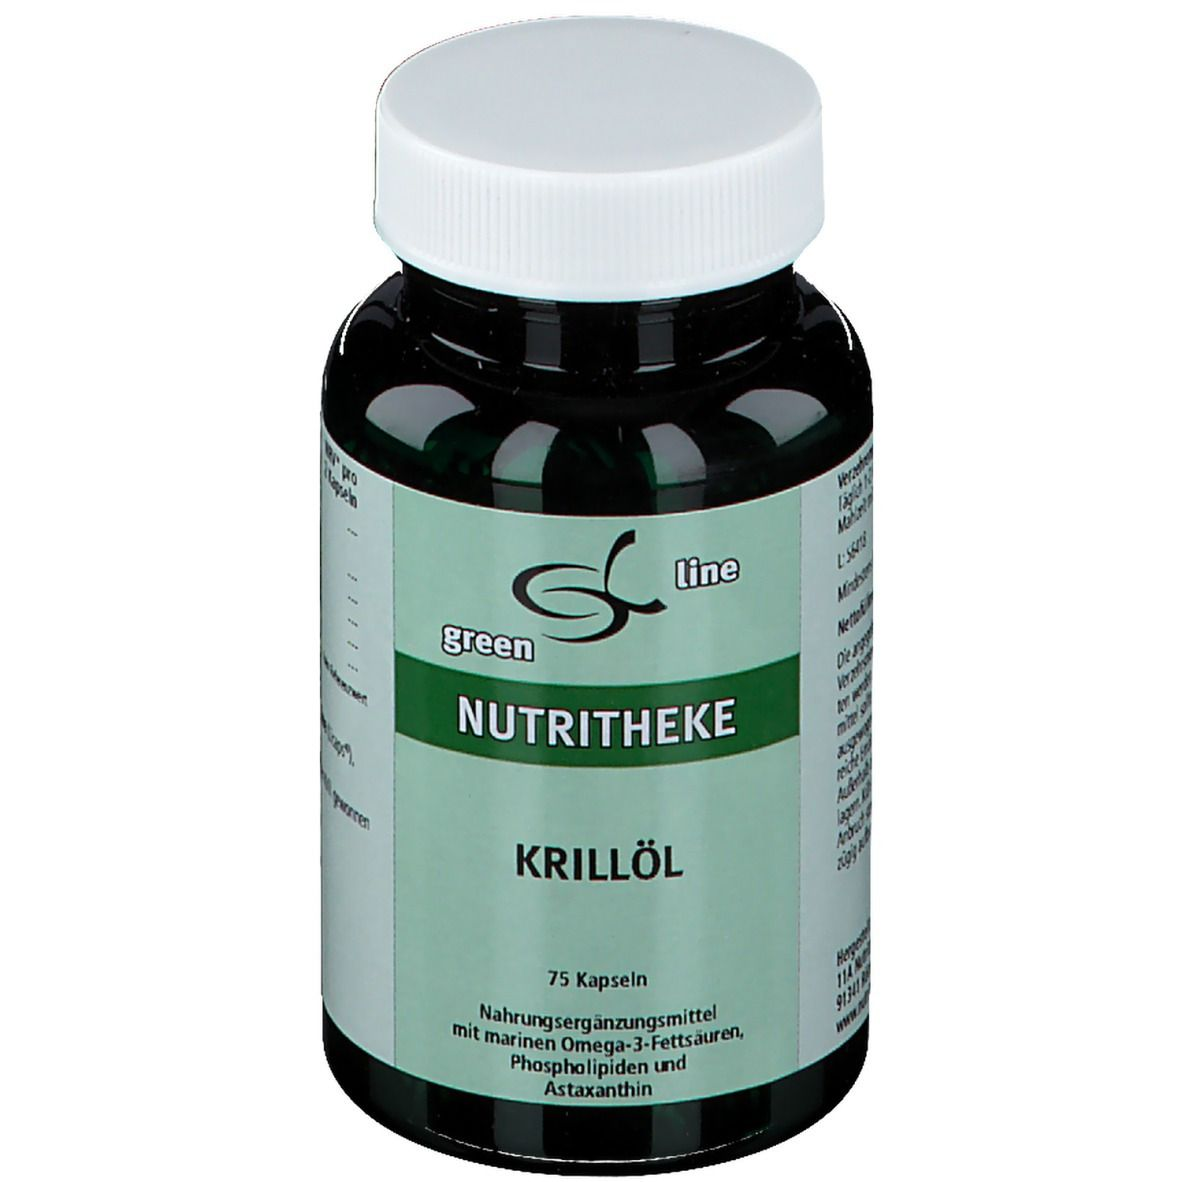 Image of green line Krill-Öl